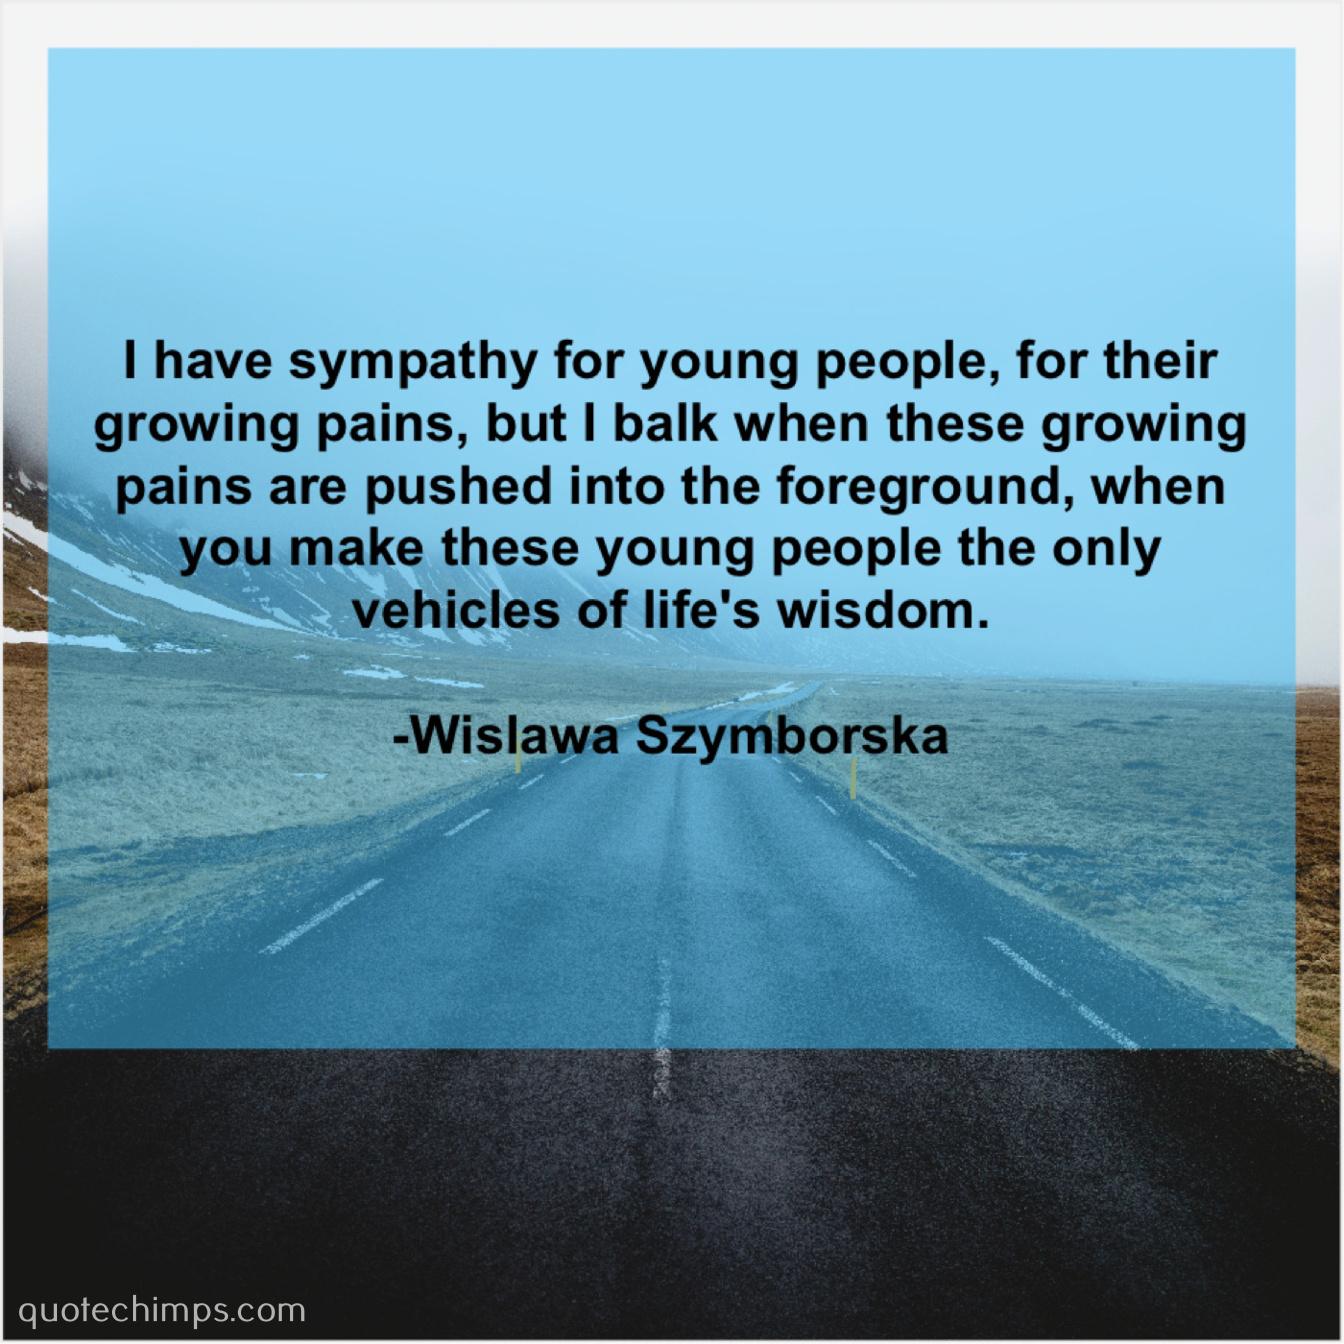 Wislawa Szymborska Quote Chimps